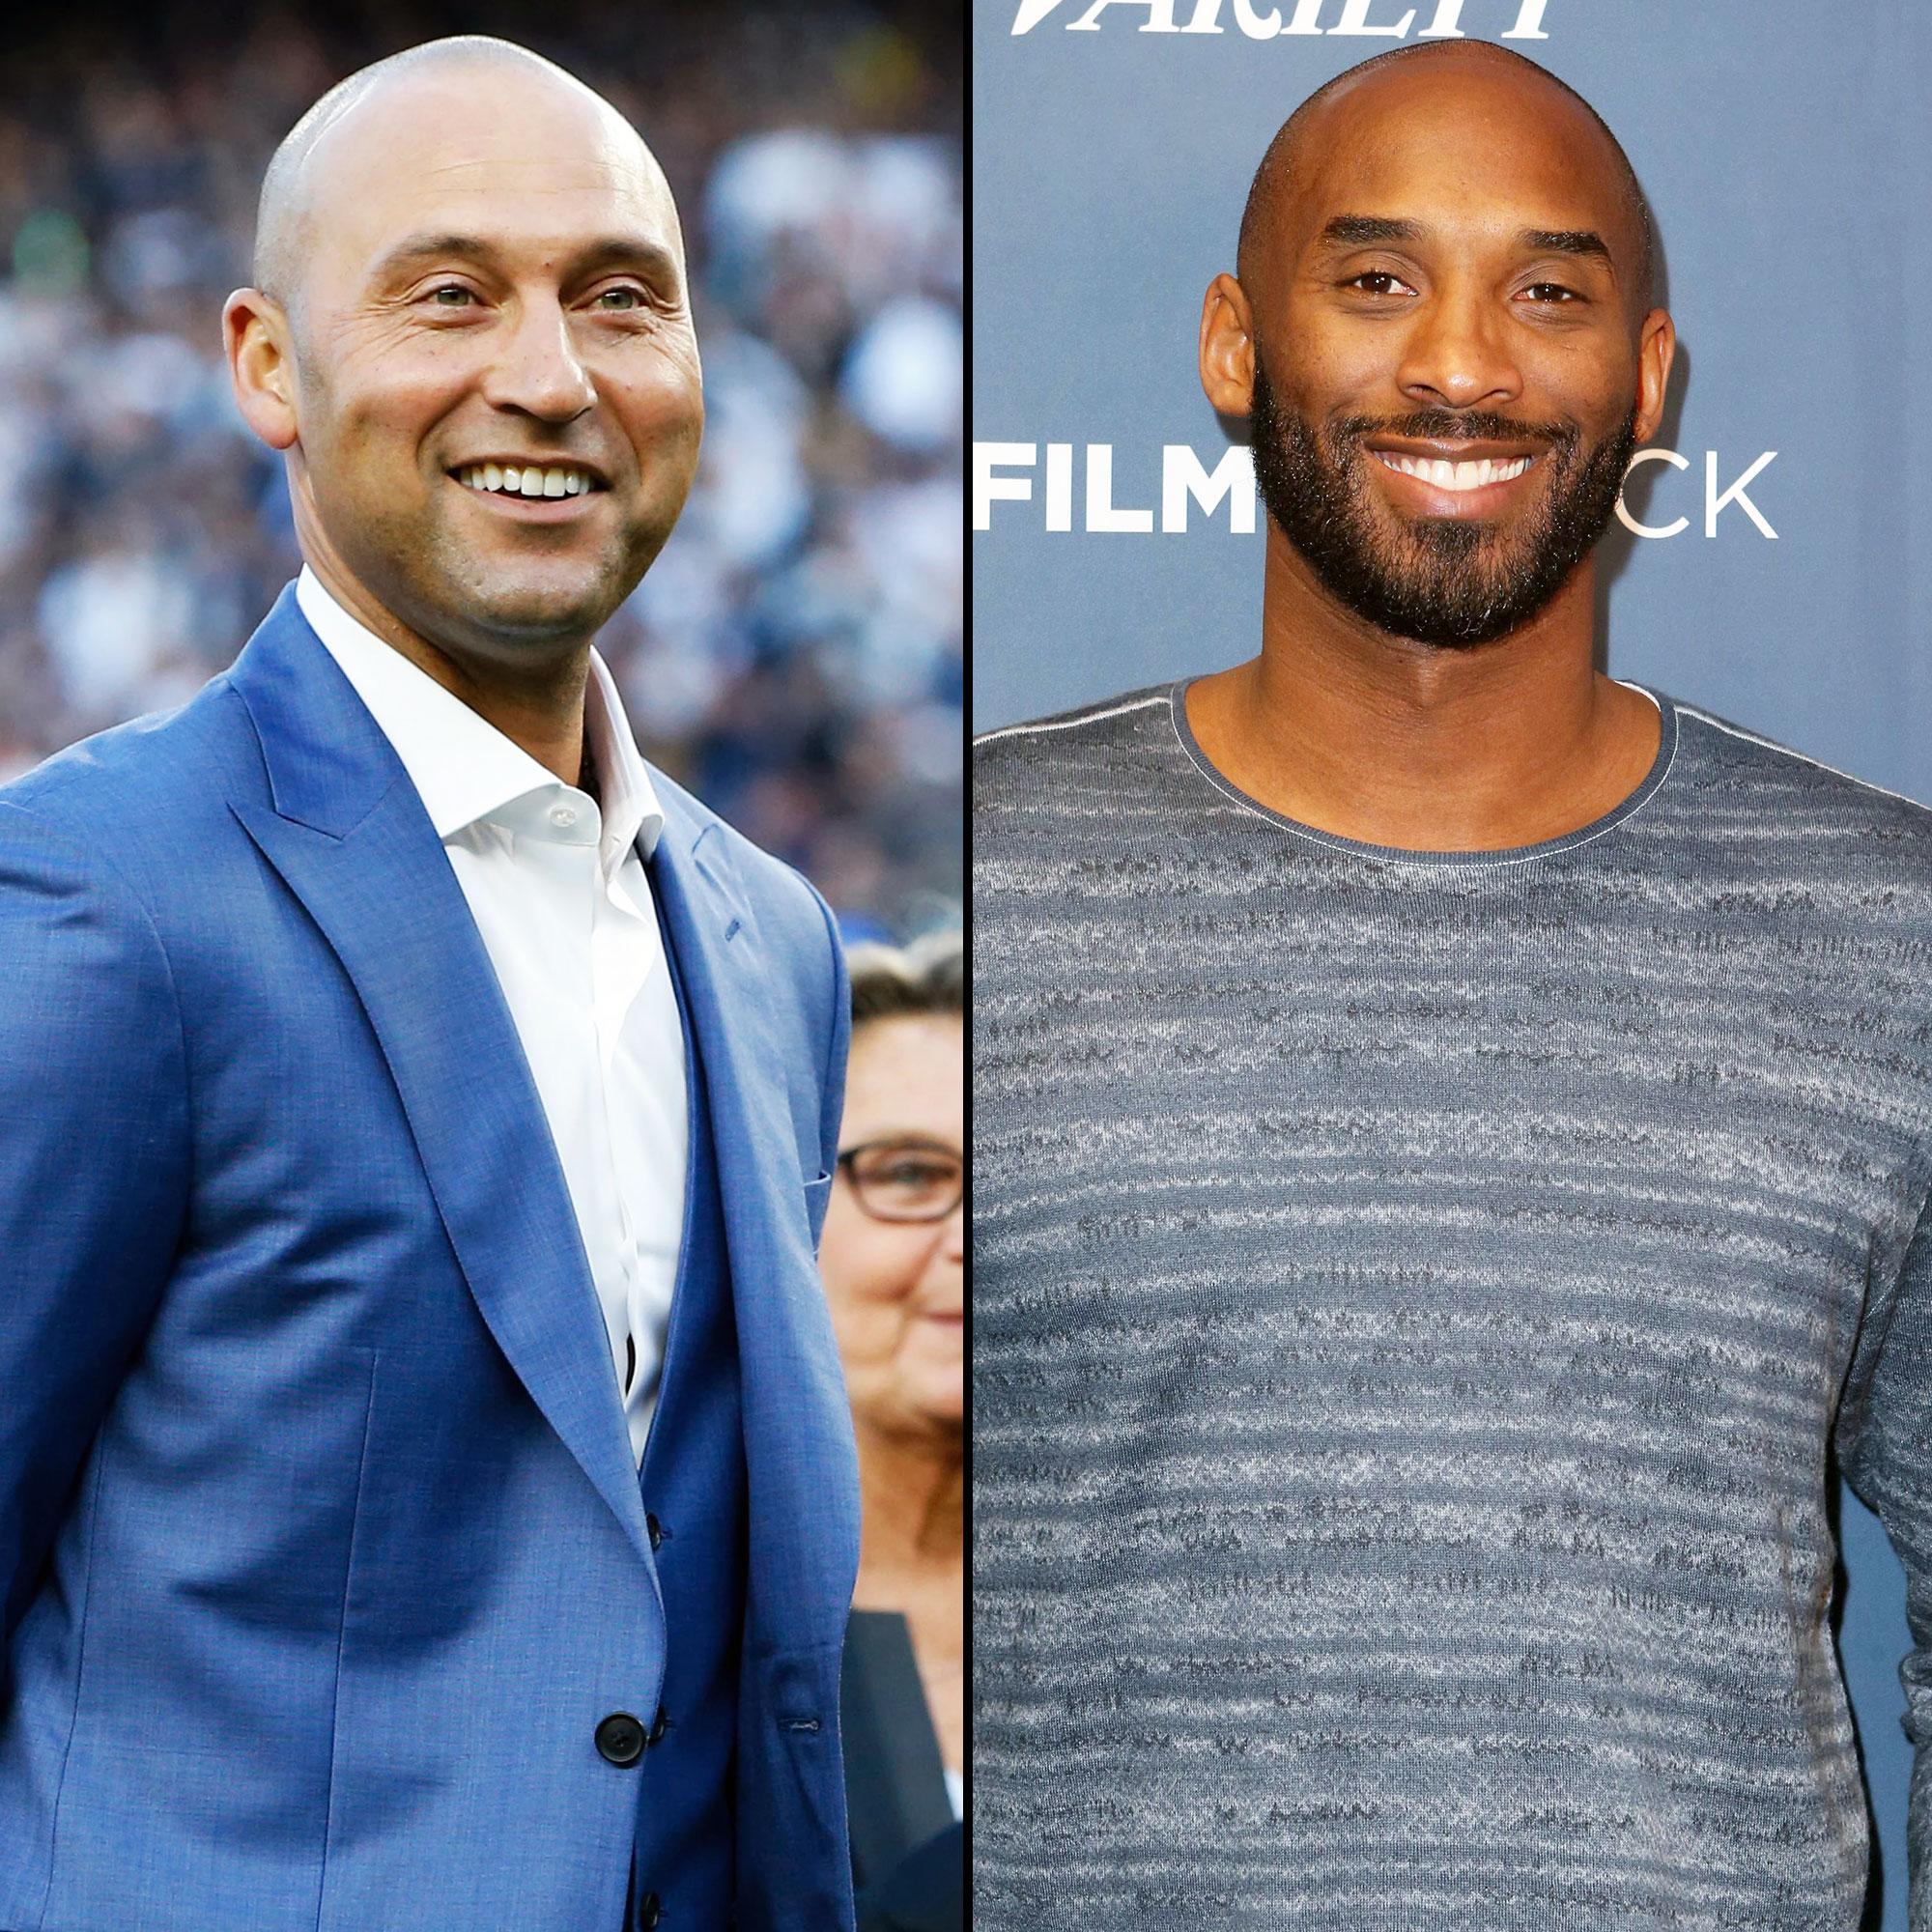 Derek Jeter Pens Emotional Tribute to Kobe Bryant